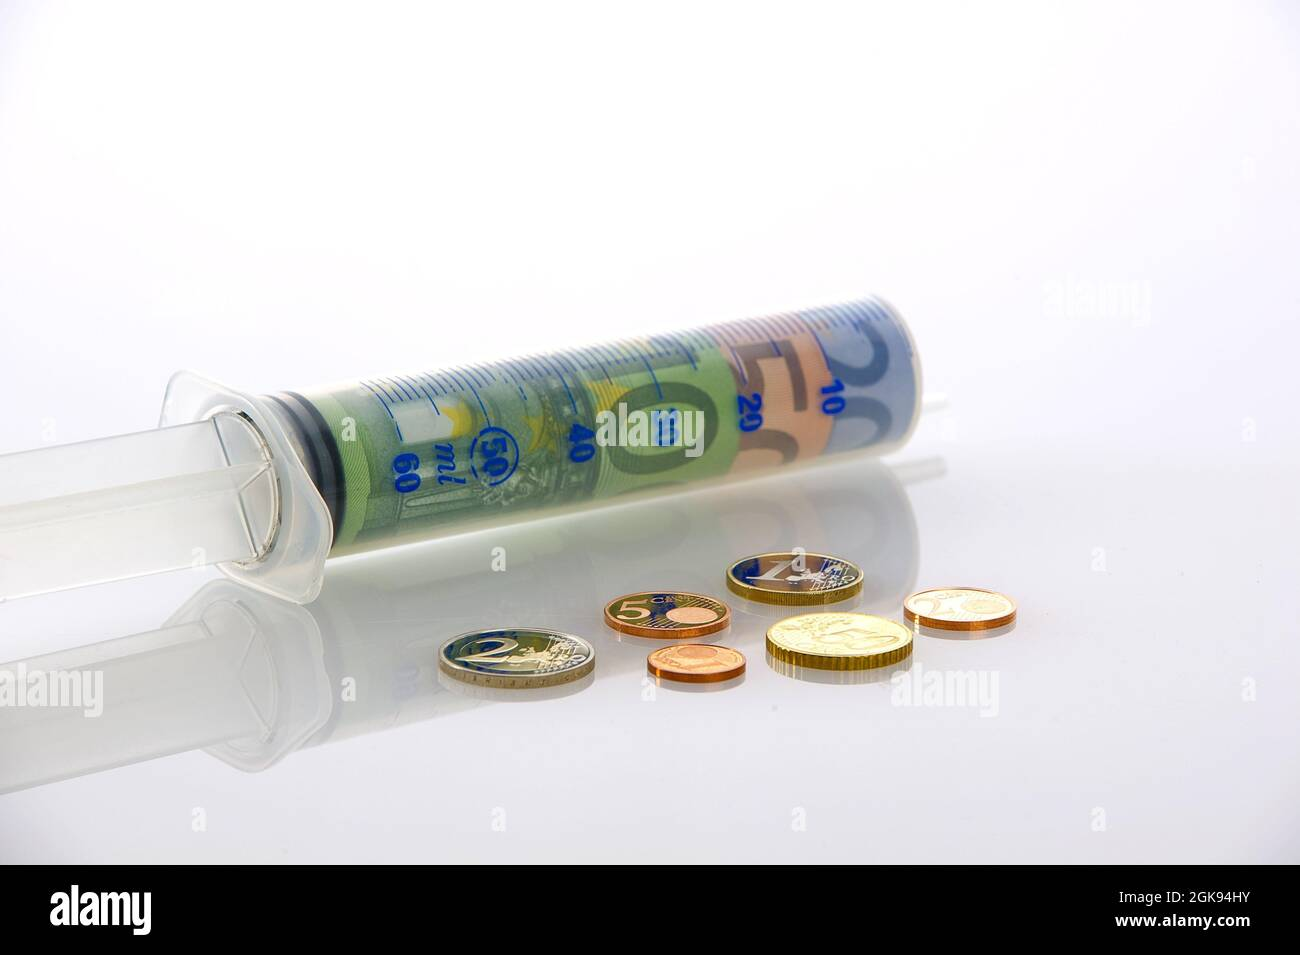 symbol picture costs of public health service Stock Photo